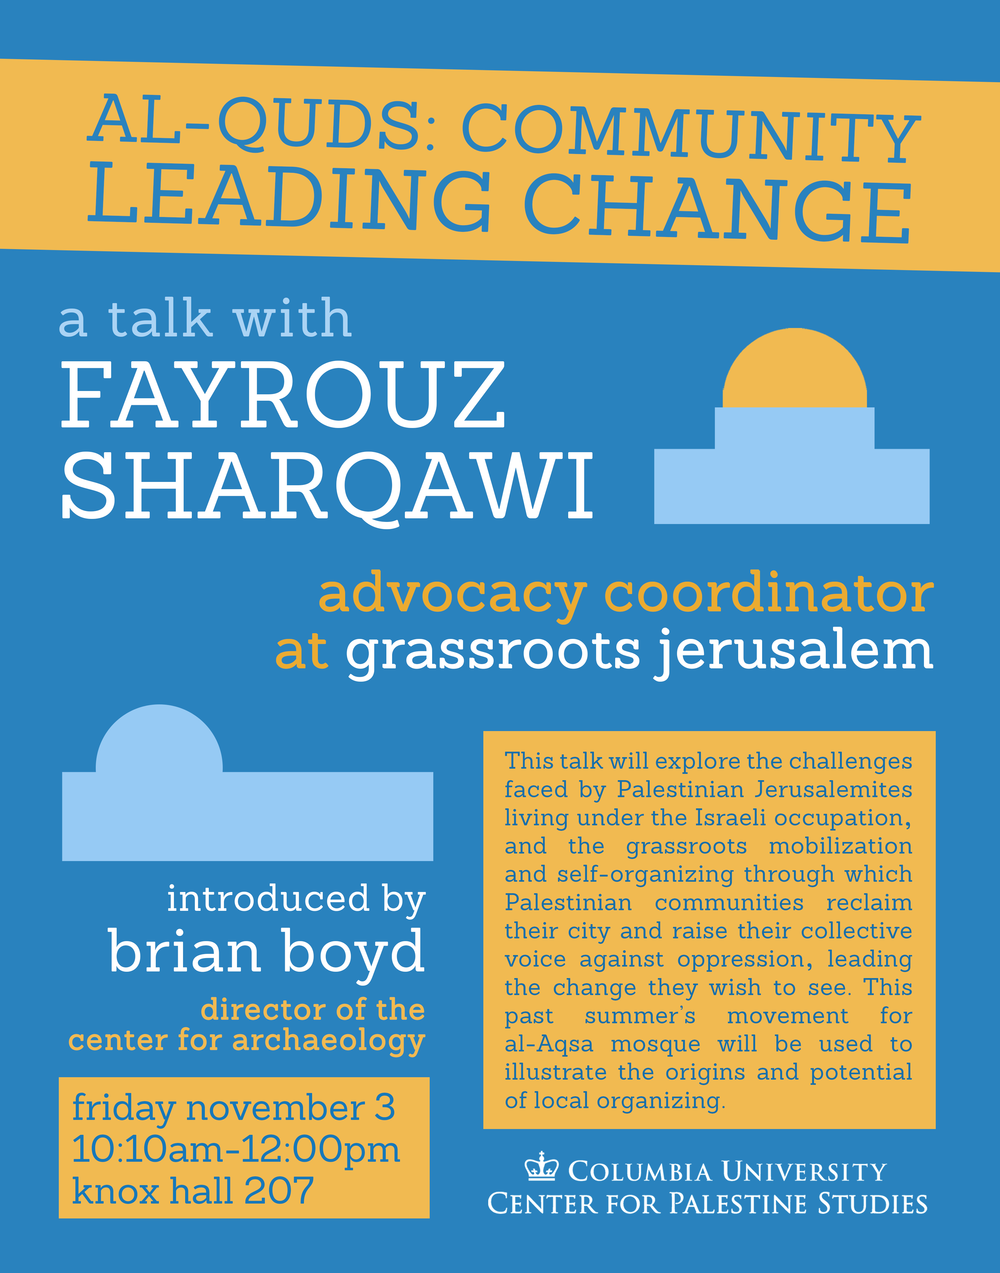 FAYROUZ SHARQAWI 11x14.png